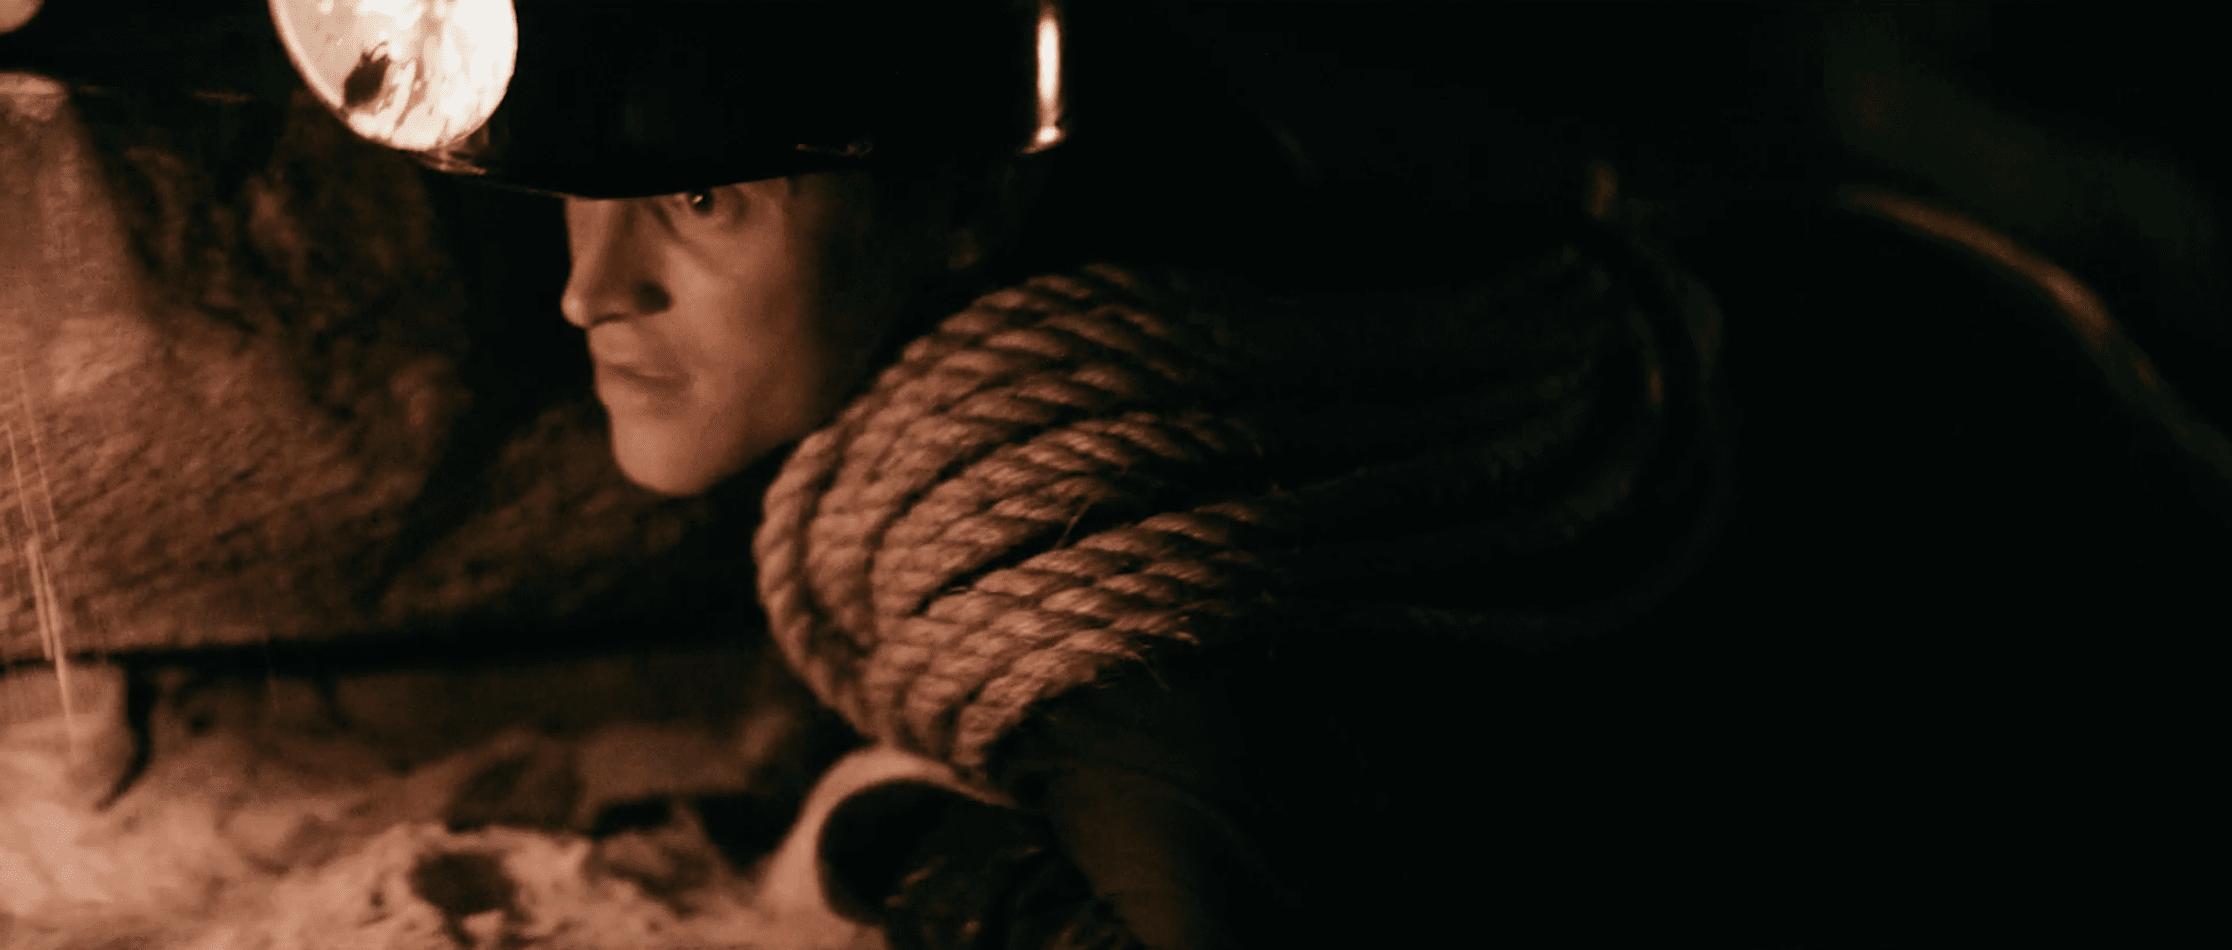 A man crawls through a cave wearing a vintage head lamp.